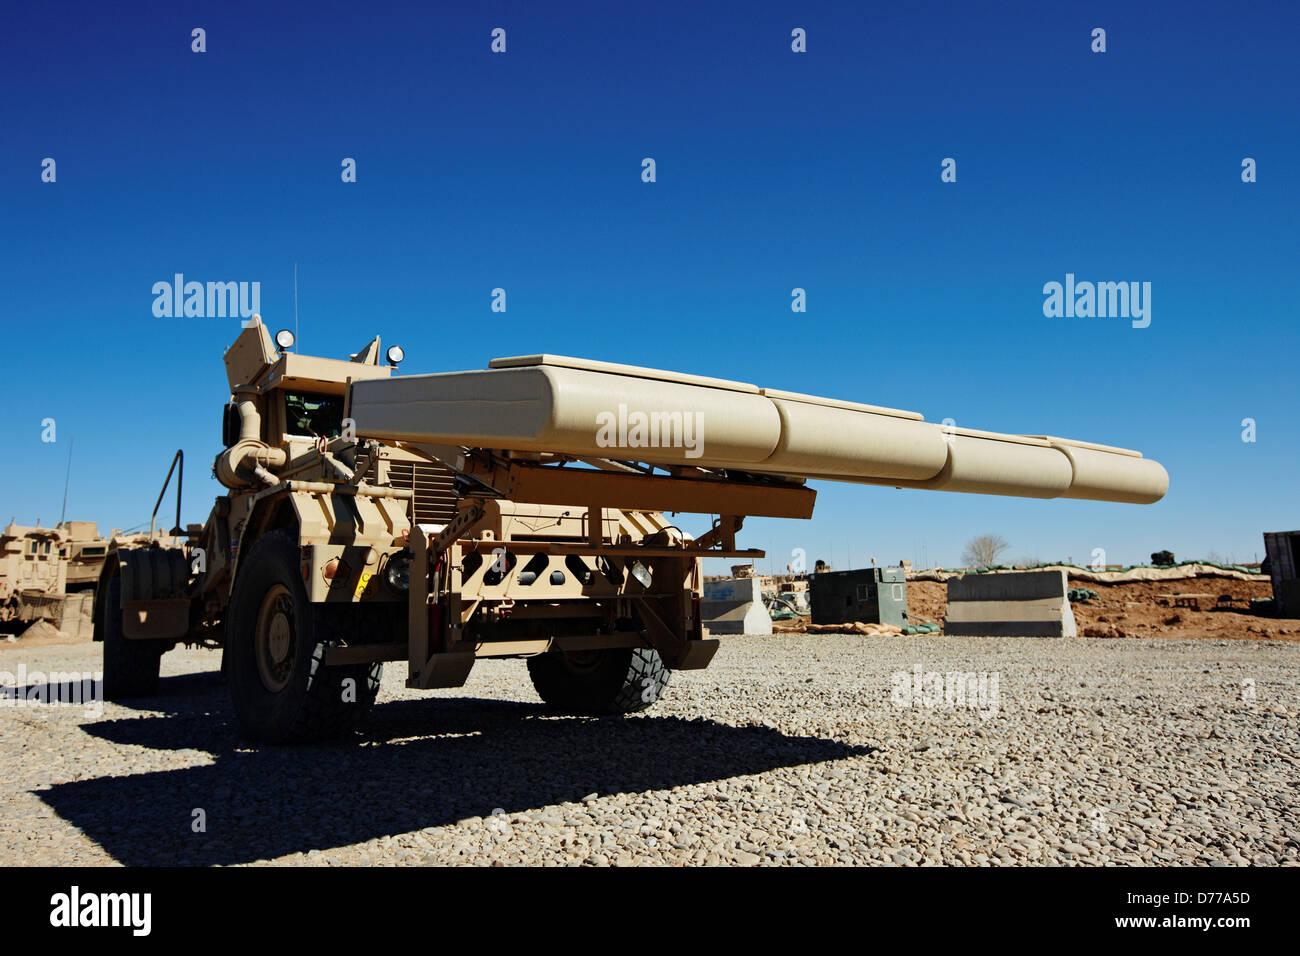 A NITEK Ground Penetrating Radar System Used to Detect Buried Explosives U.S Marine Corps Forward Operating Base - Stock Image